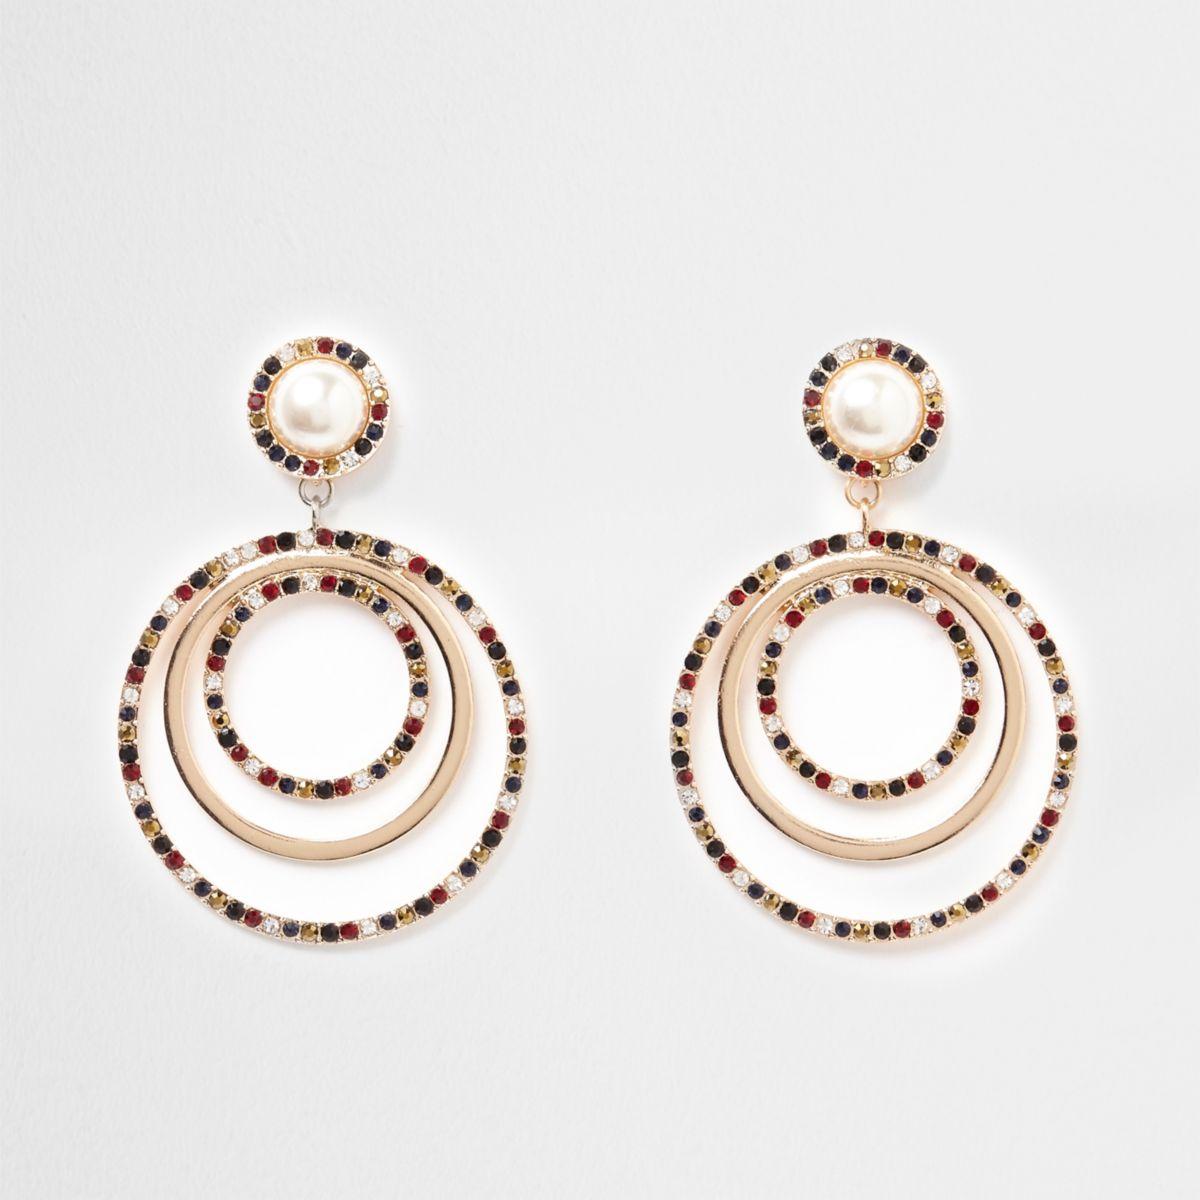 Gold tone pearl rhinestone ring drop earrings